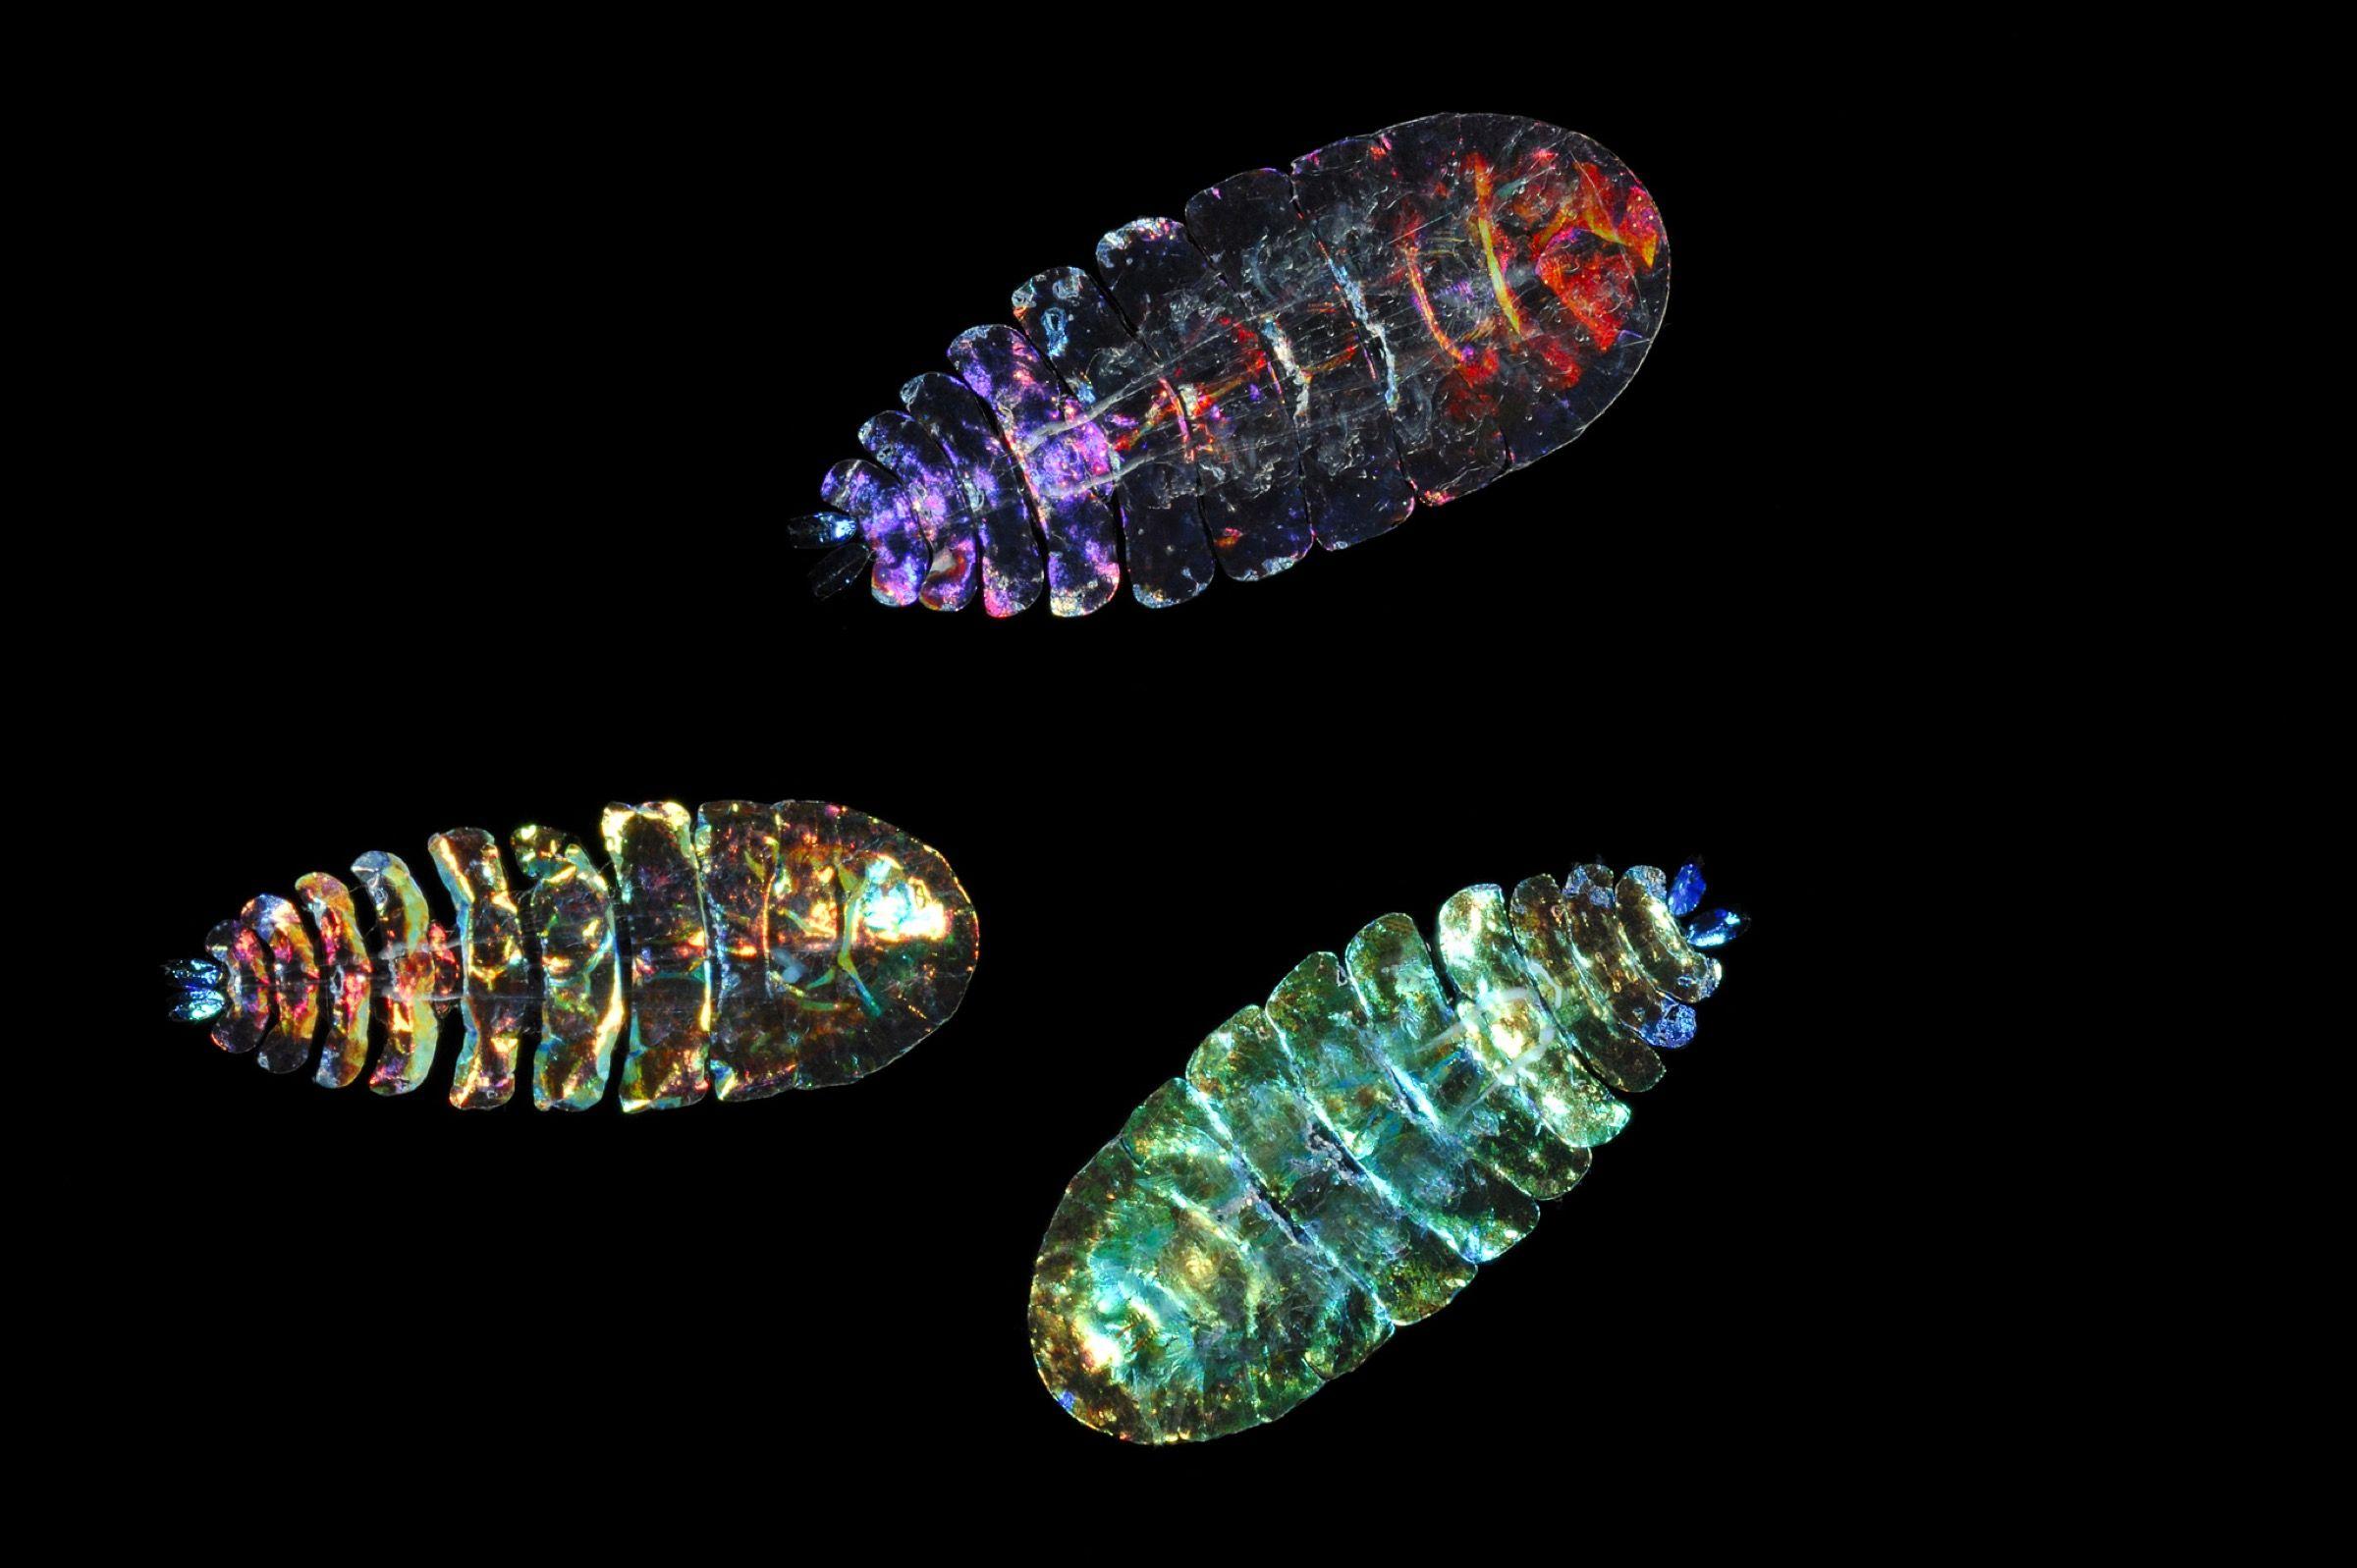 Male copepods